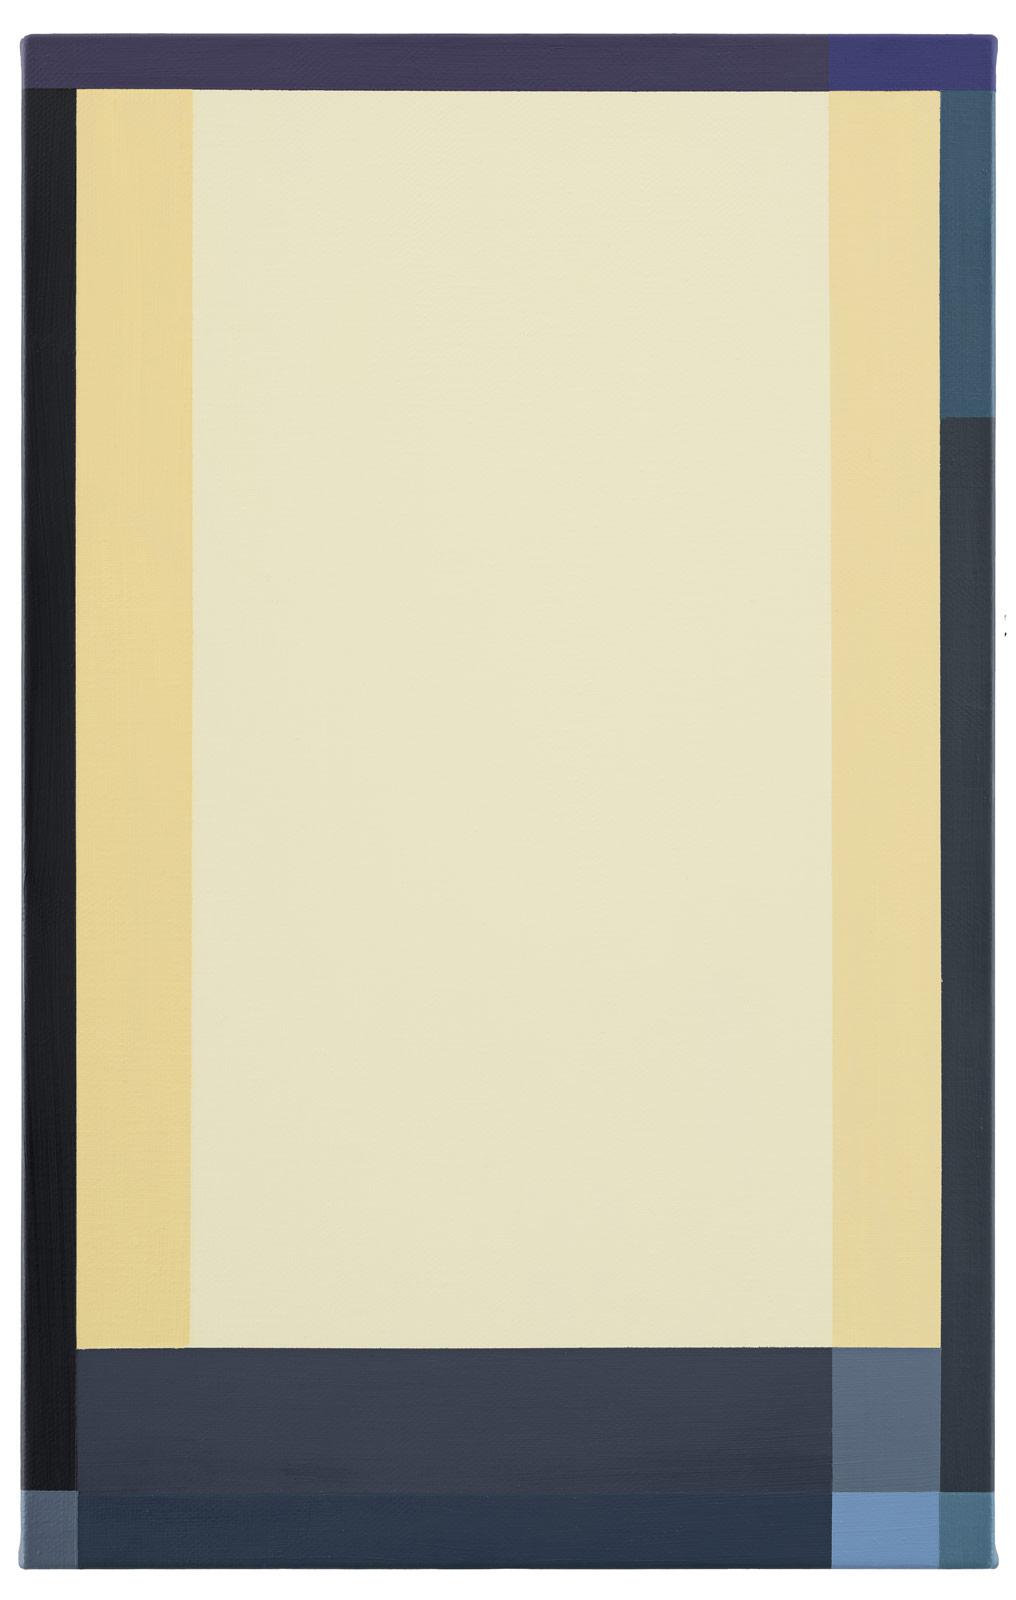 Ljuset, 2019. Oil on canvas, 55,5 x 35,5 x 2 cm